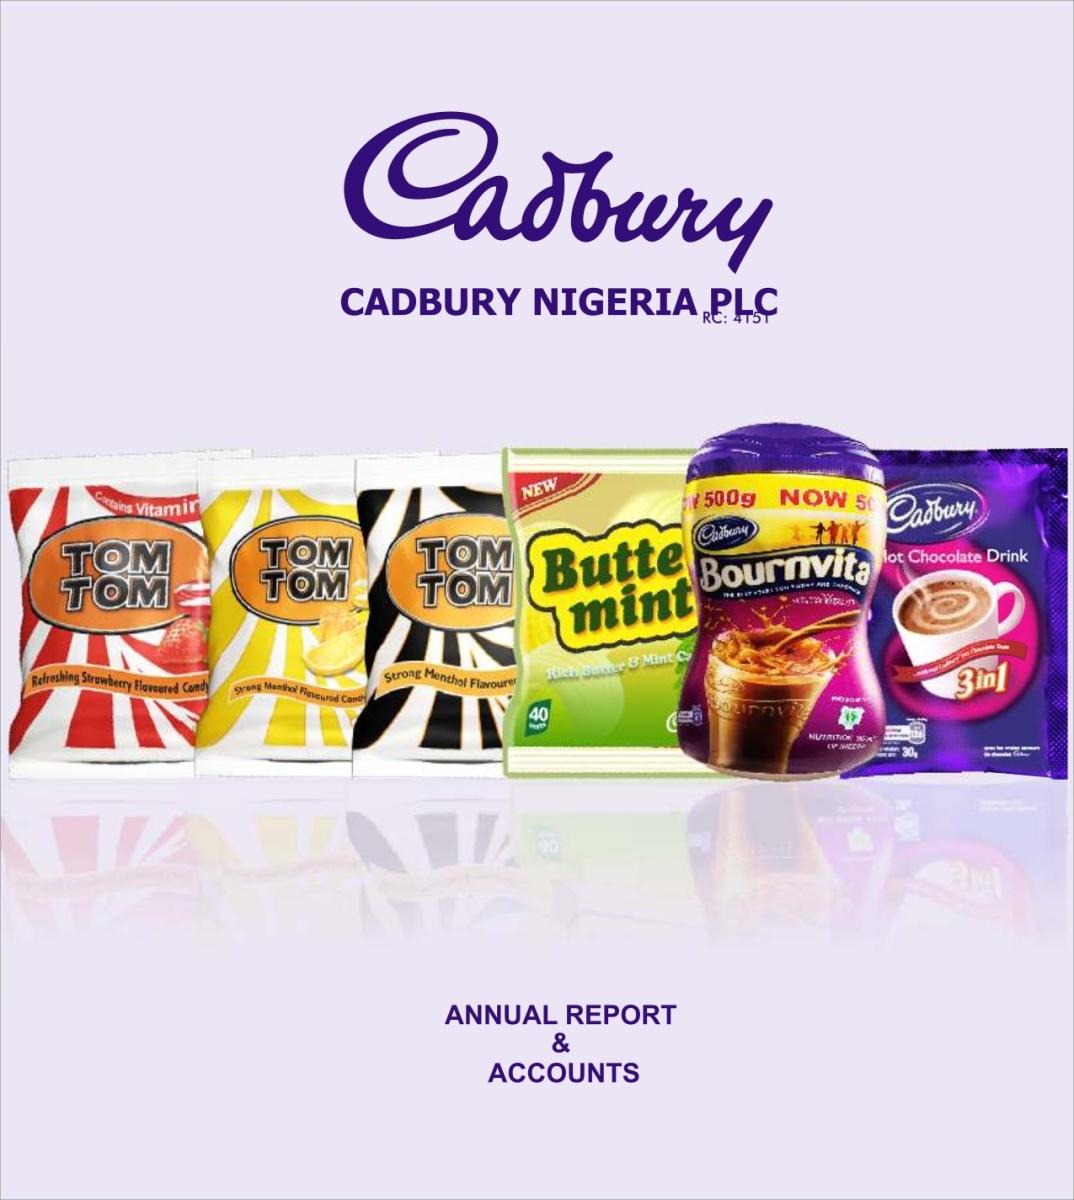 Cadbury Nigeria Plc.